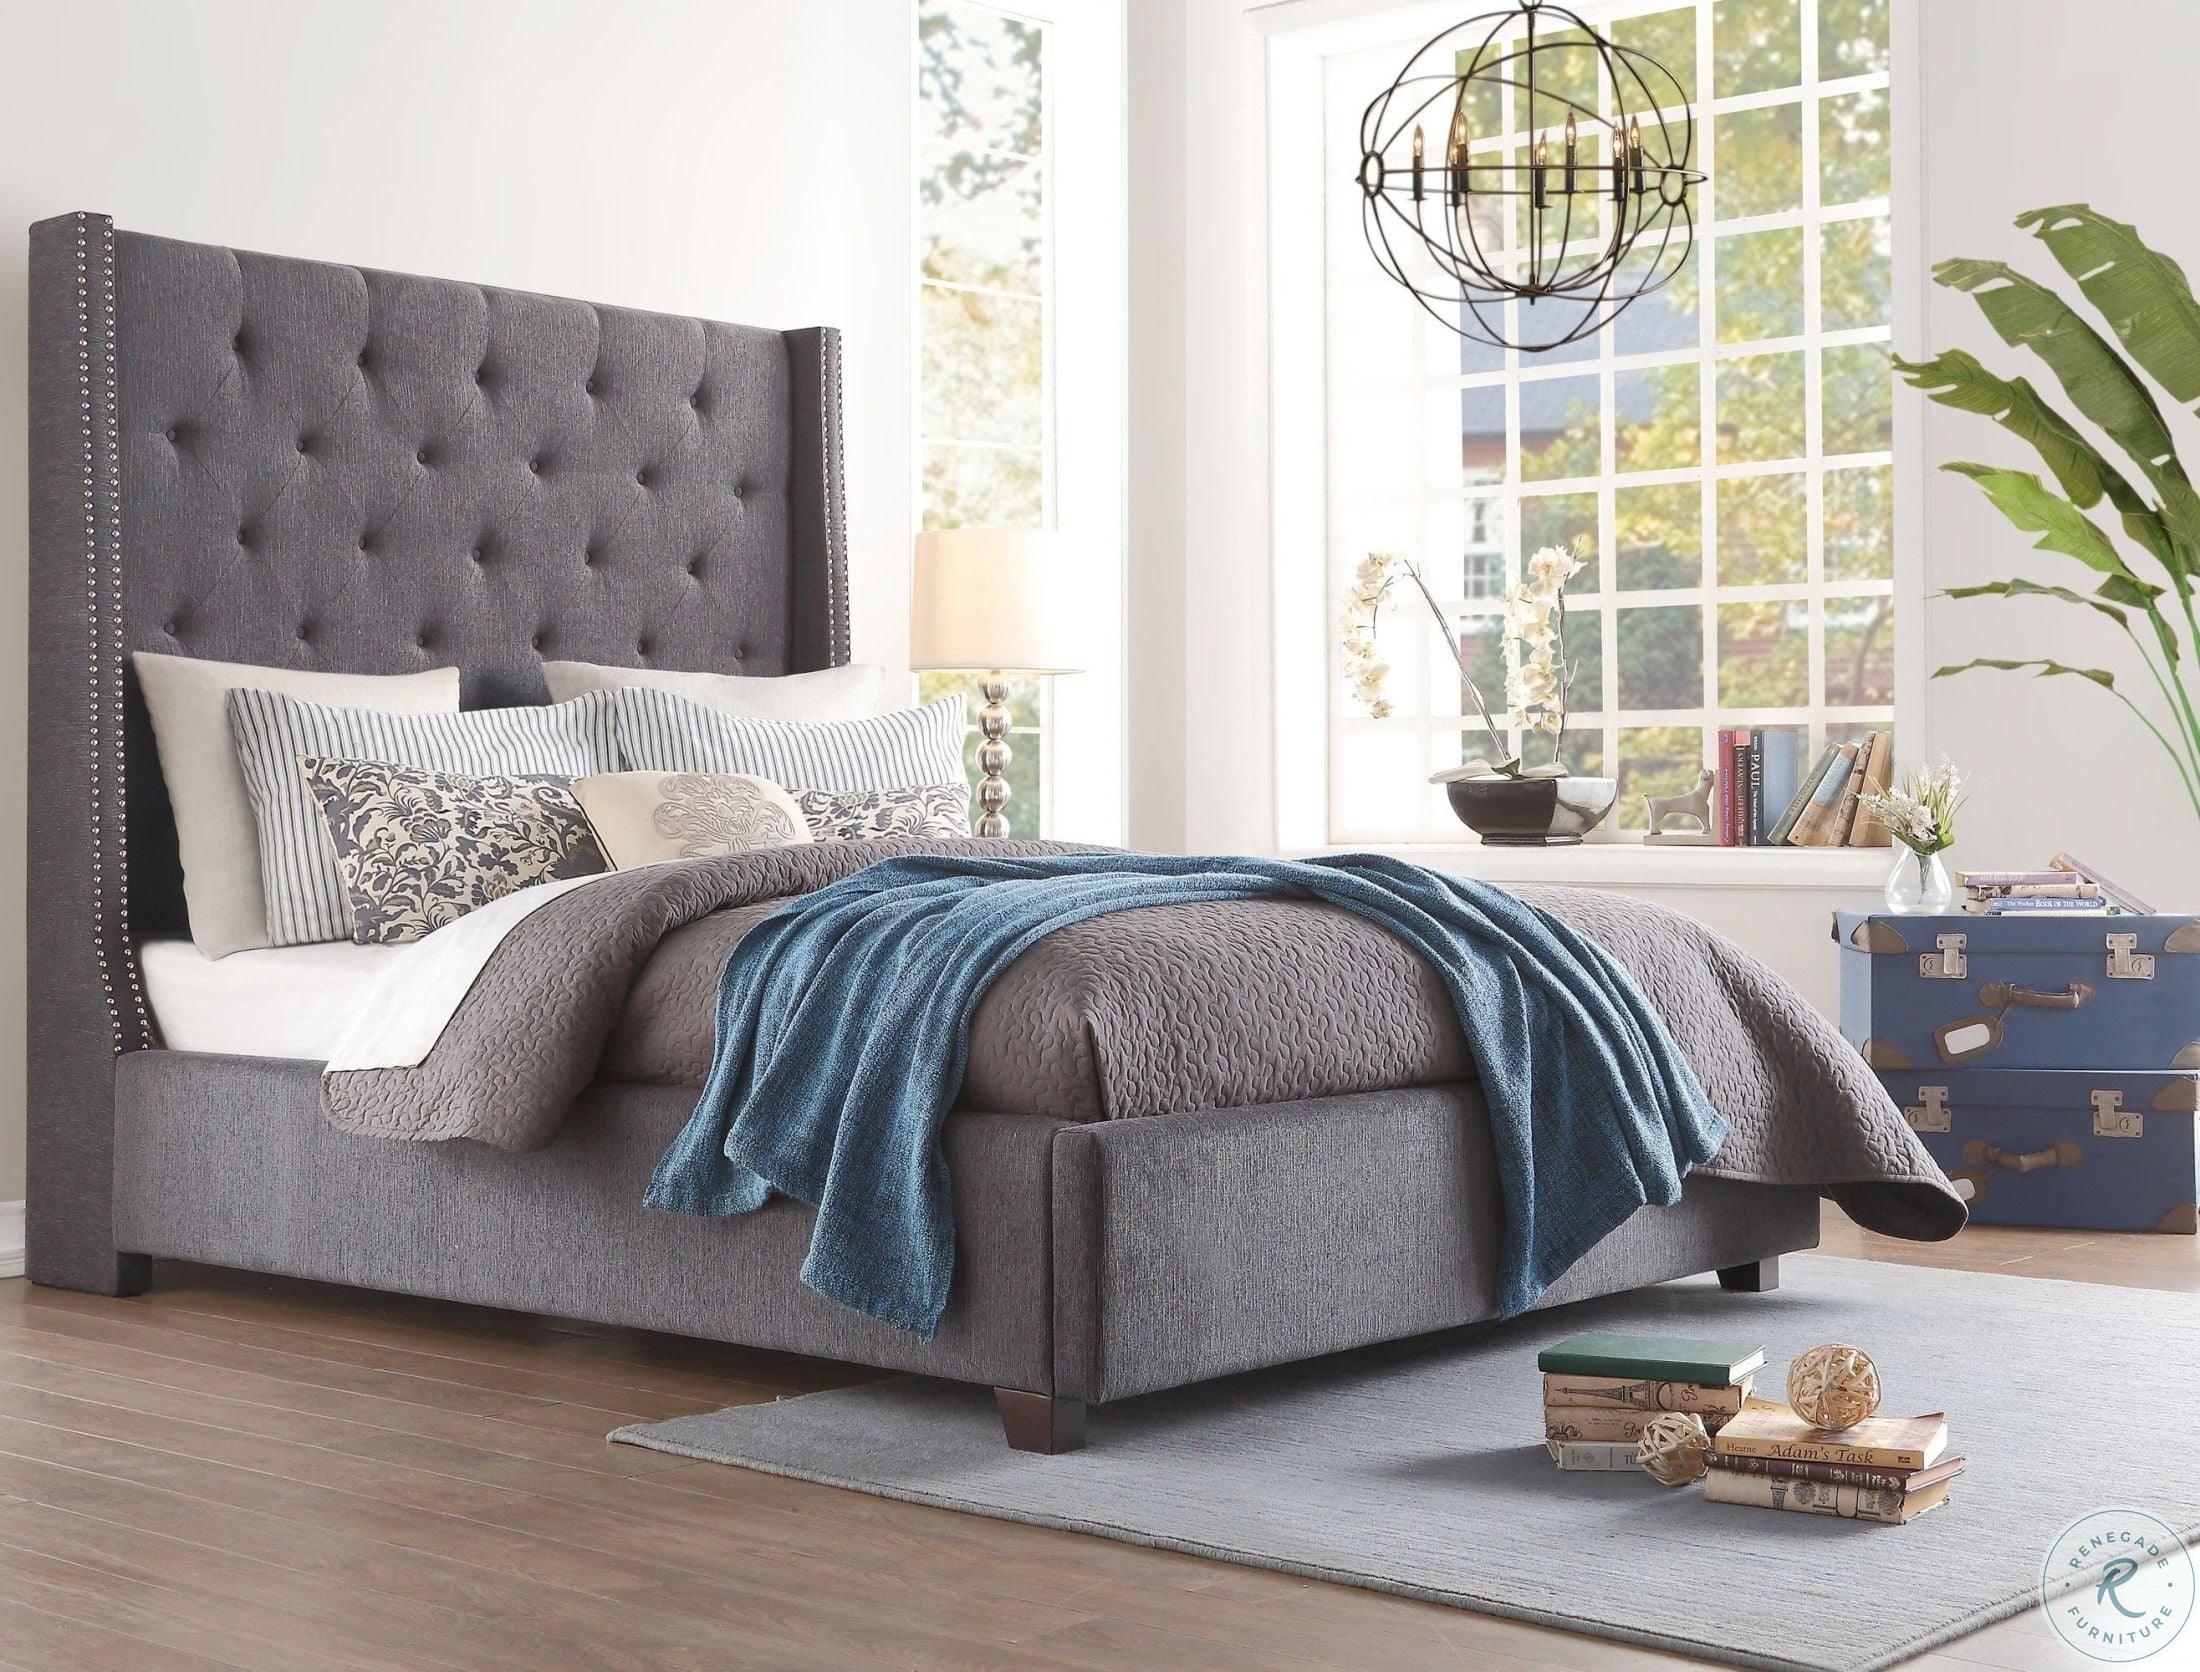 Picture of: Fairborn Dark Gray Cal King Upholstered Platform Bed From Homelegance Coleman Furniture